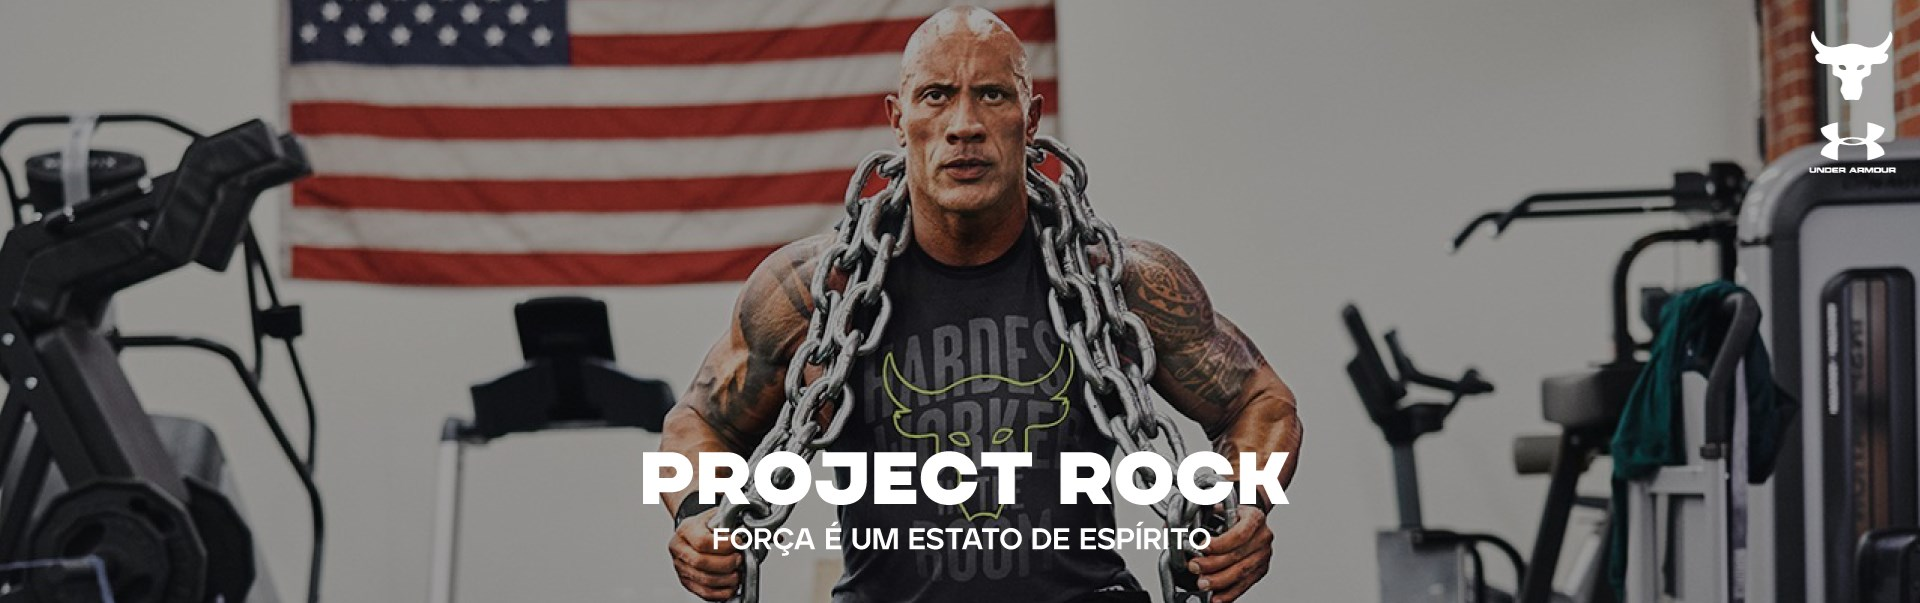 Project Rock